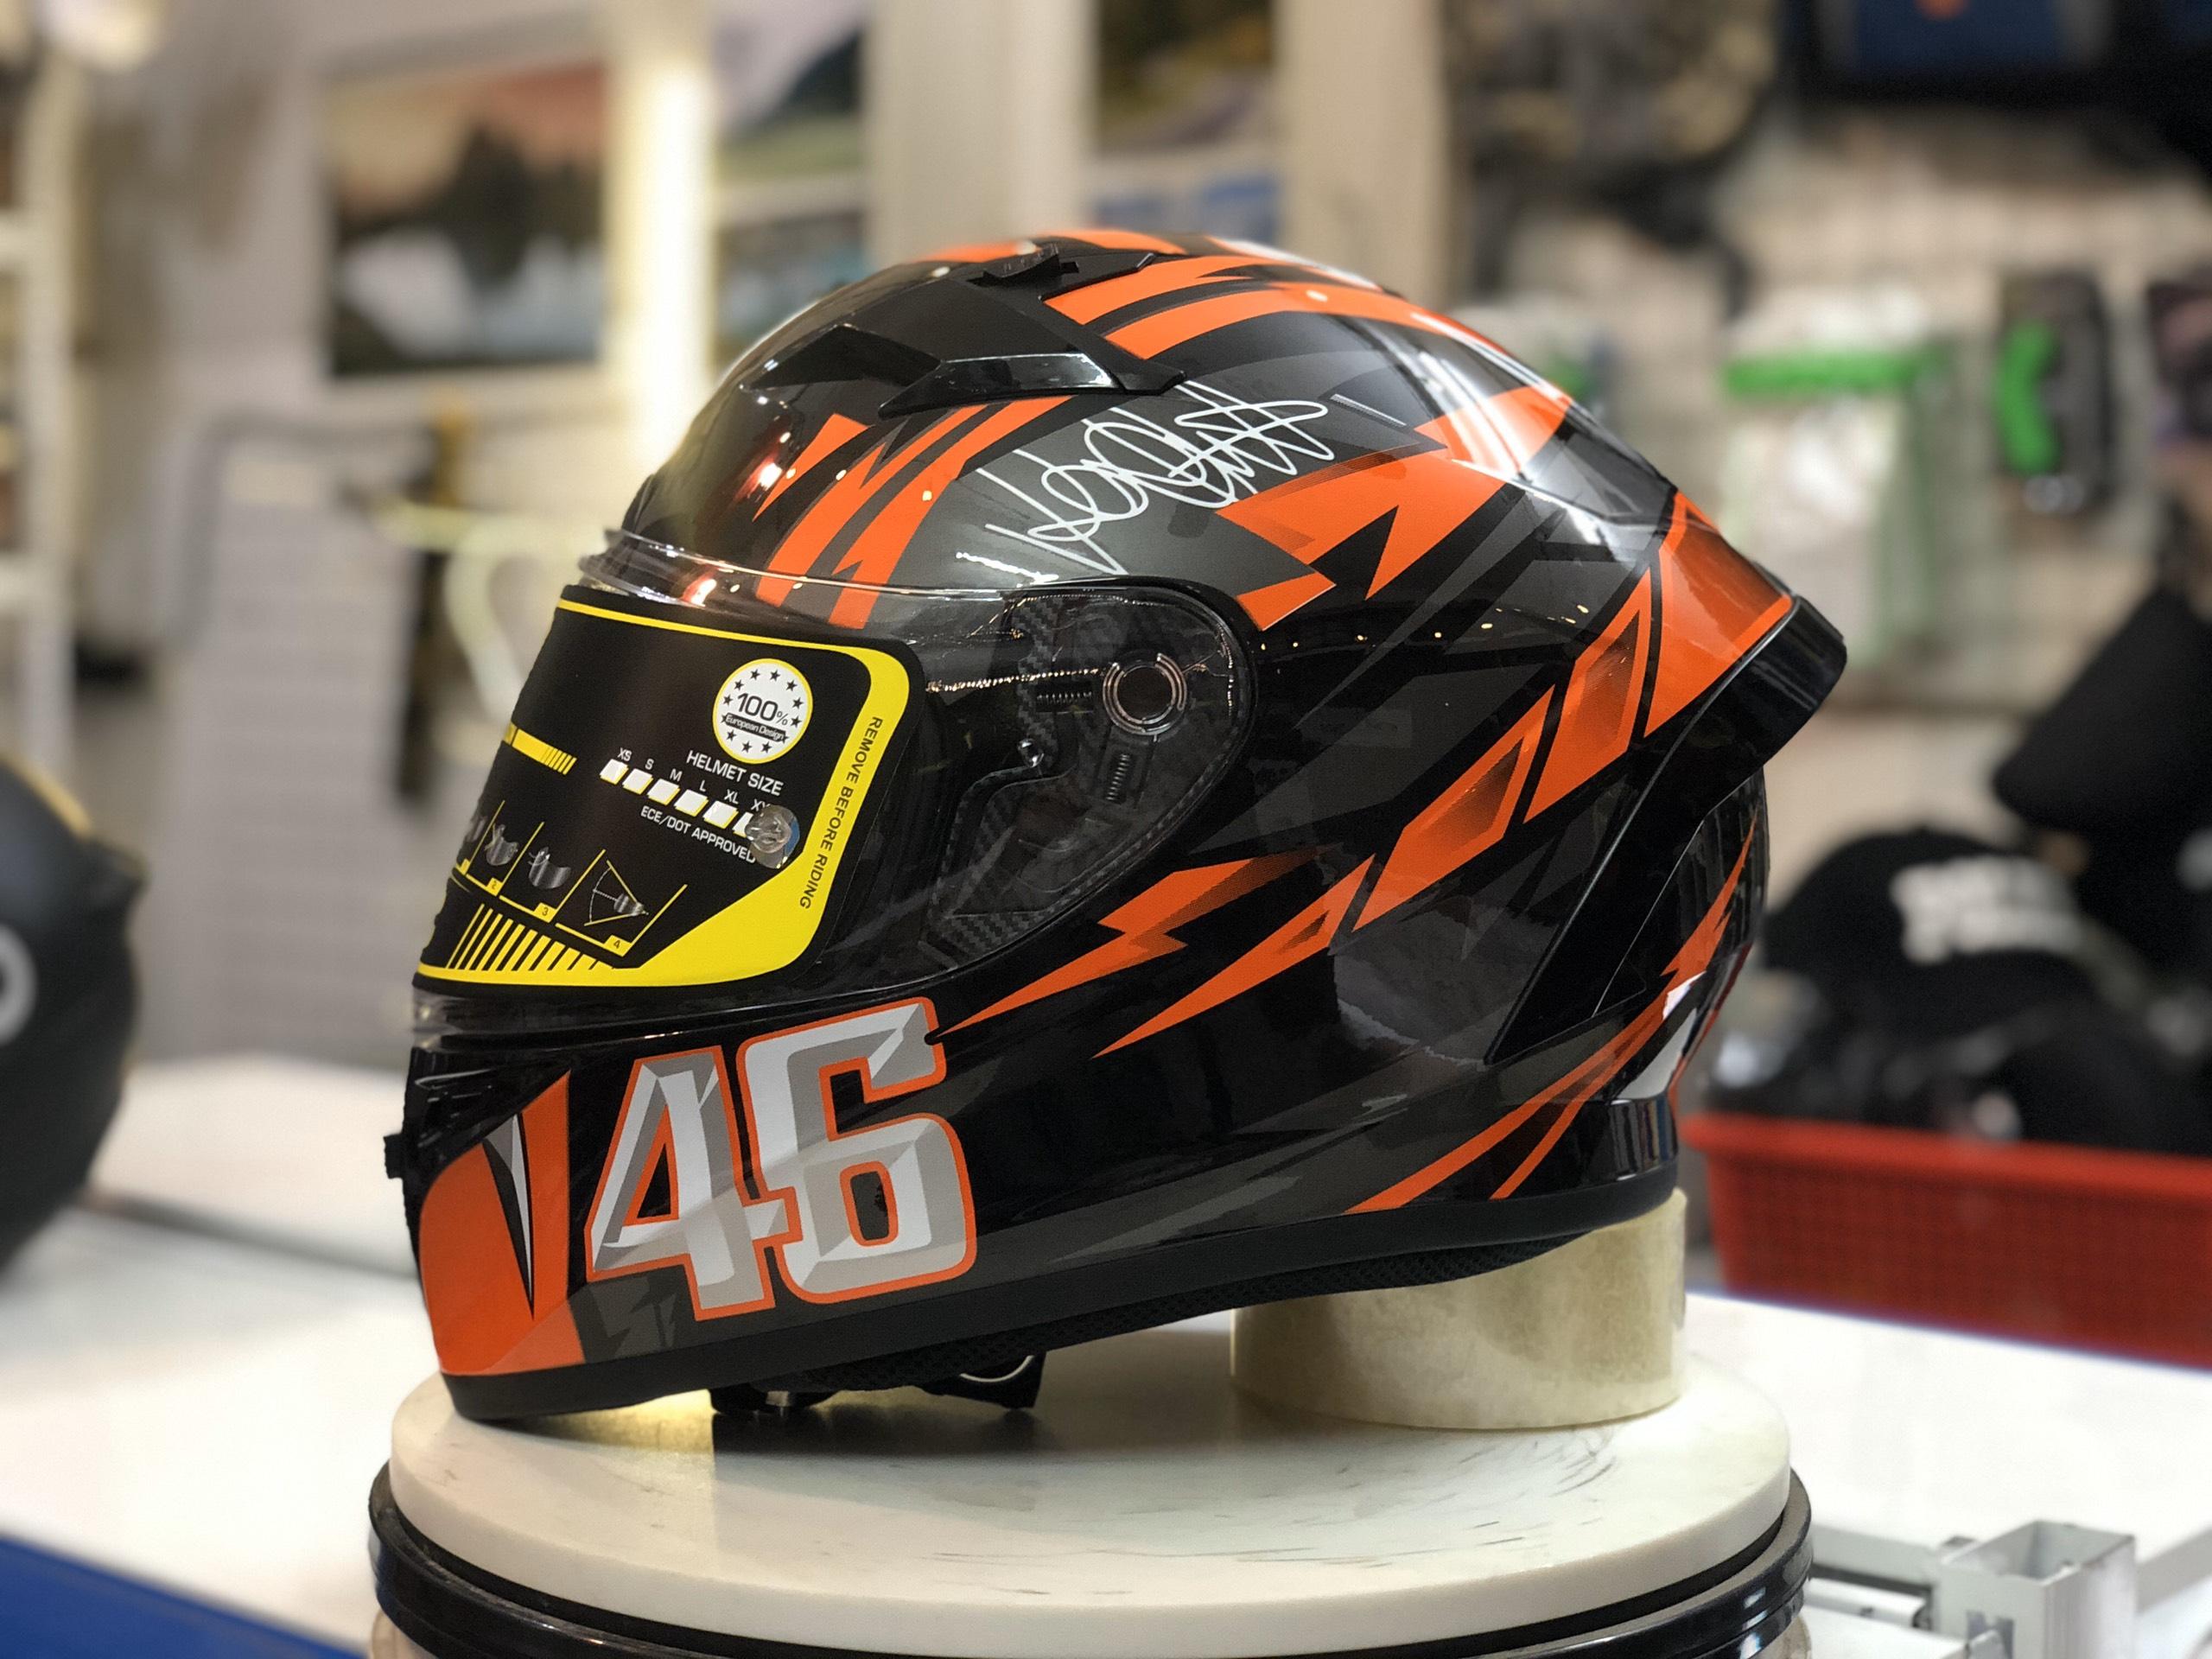 Mũ bảo hiểm Roc R01 cam đen (4)